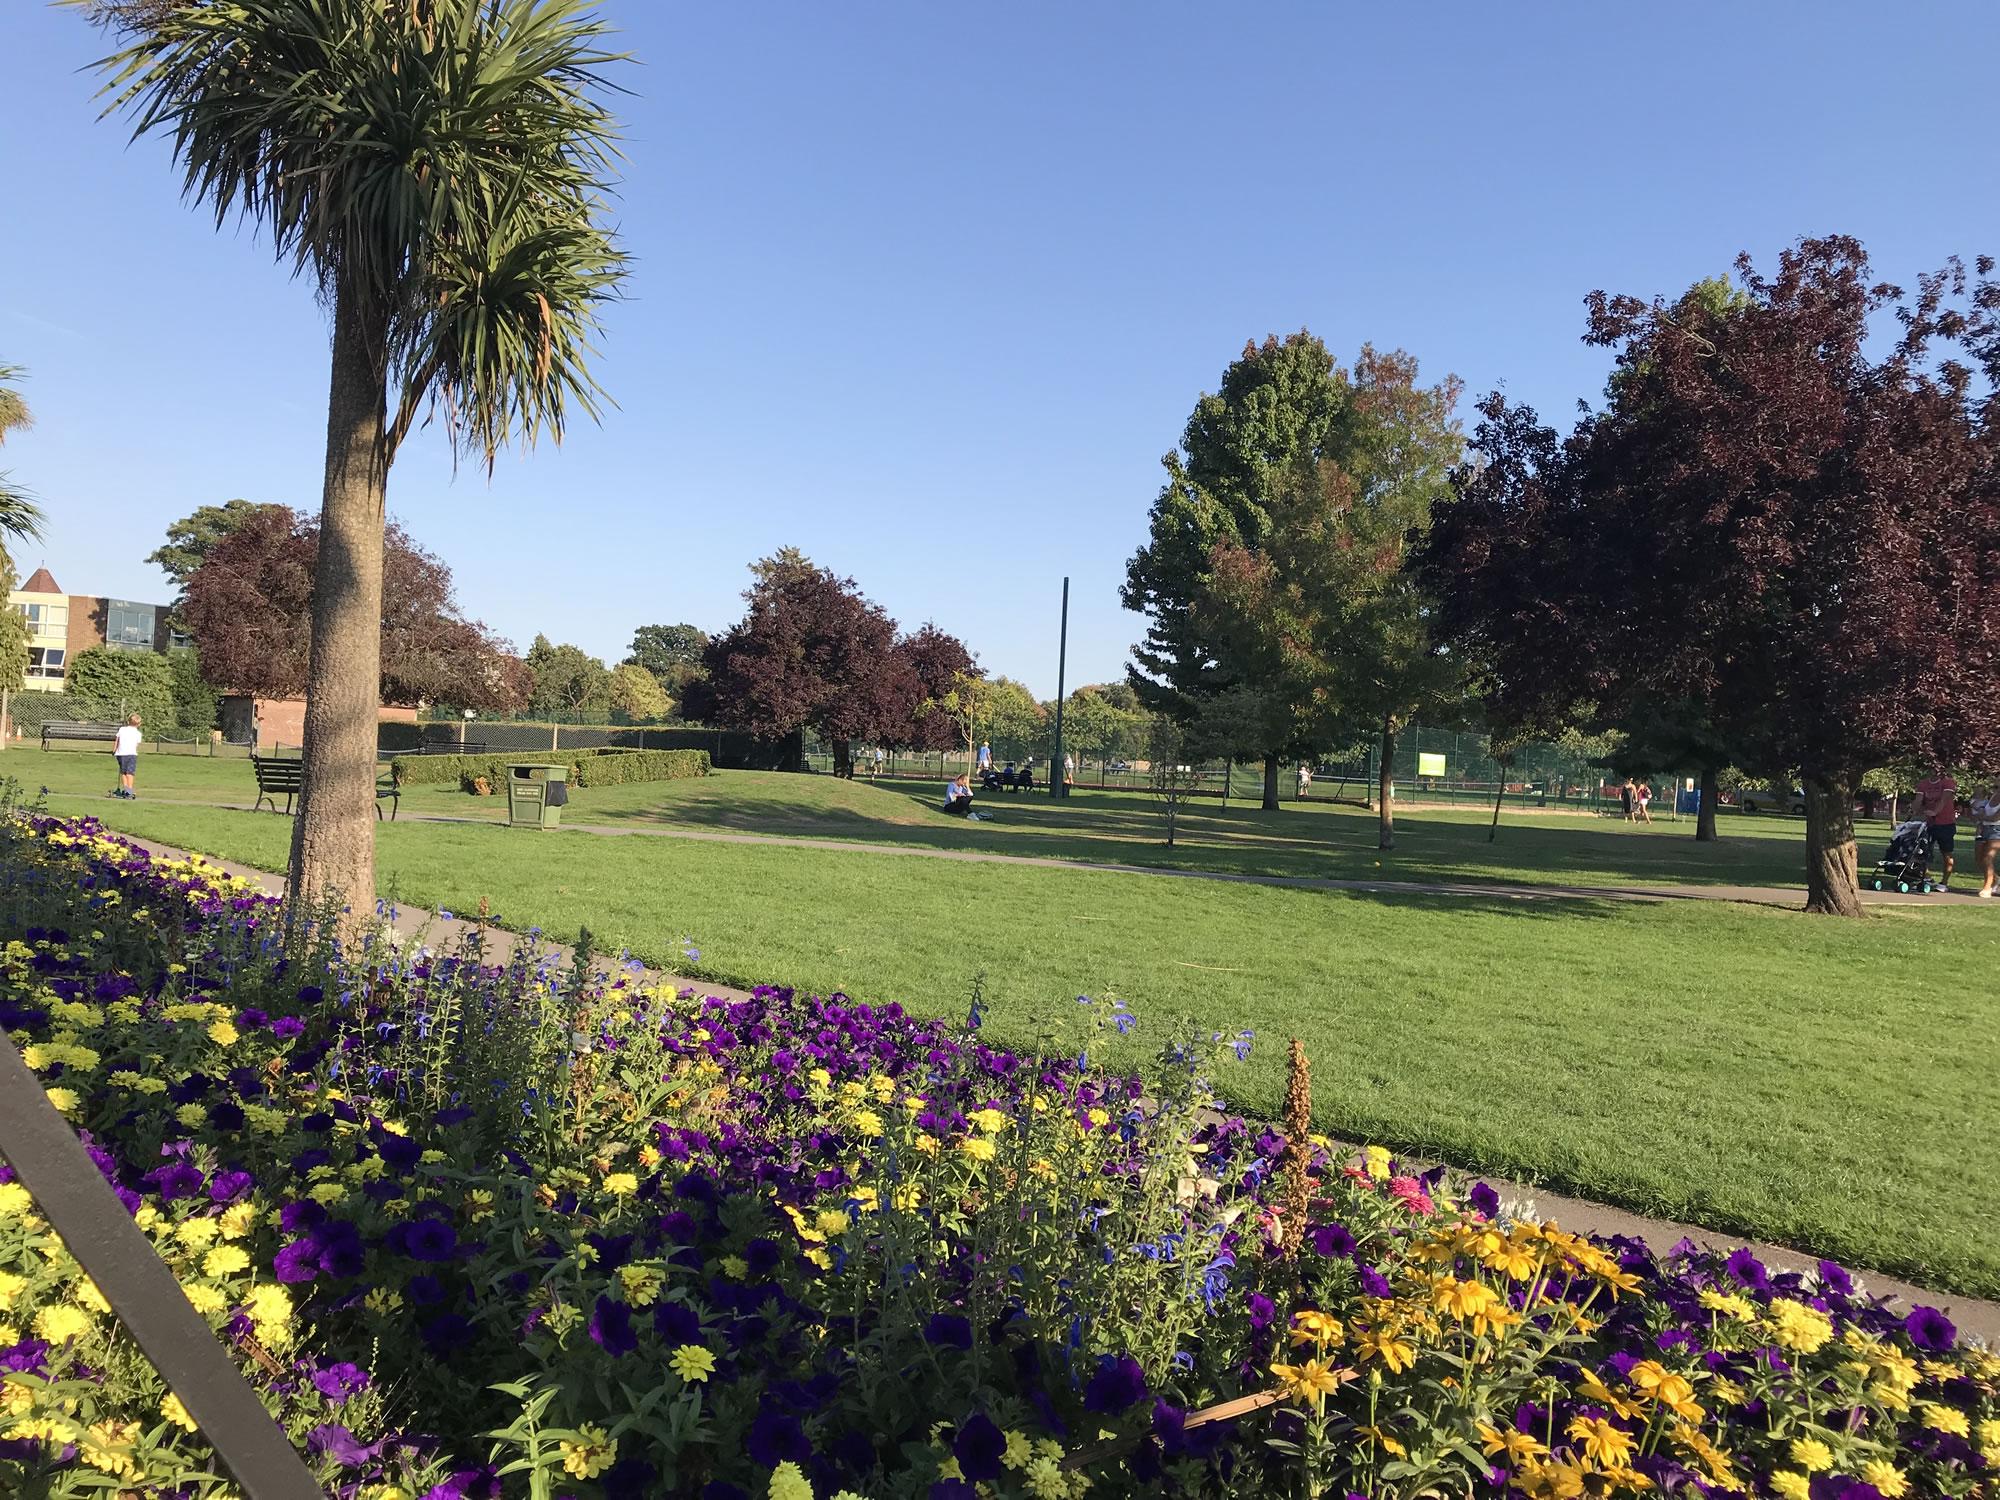 Flower beds and park - Churchfields Recreation Ground Weybridge Elmbridge Surrey